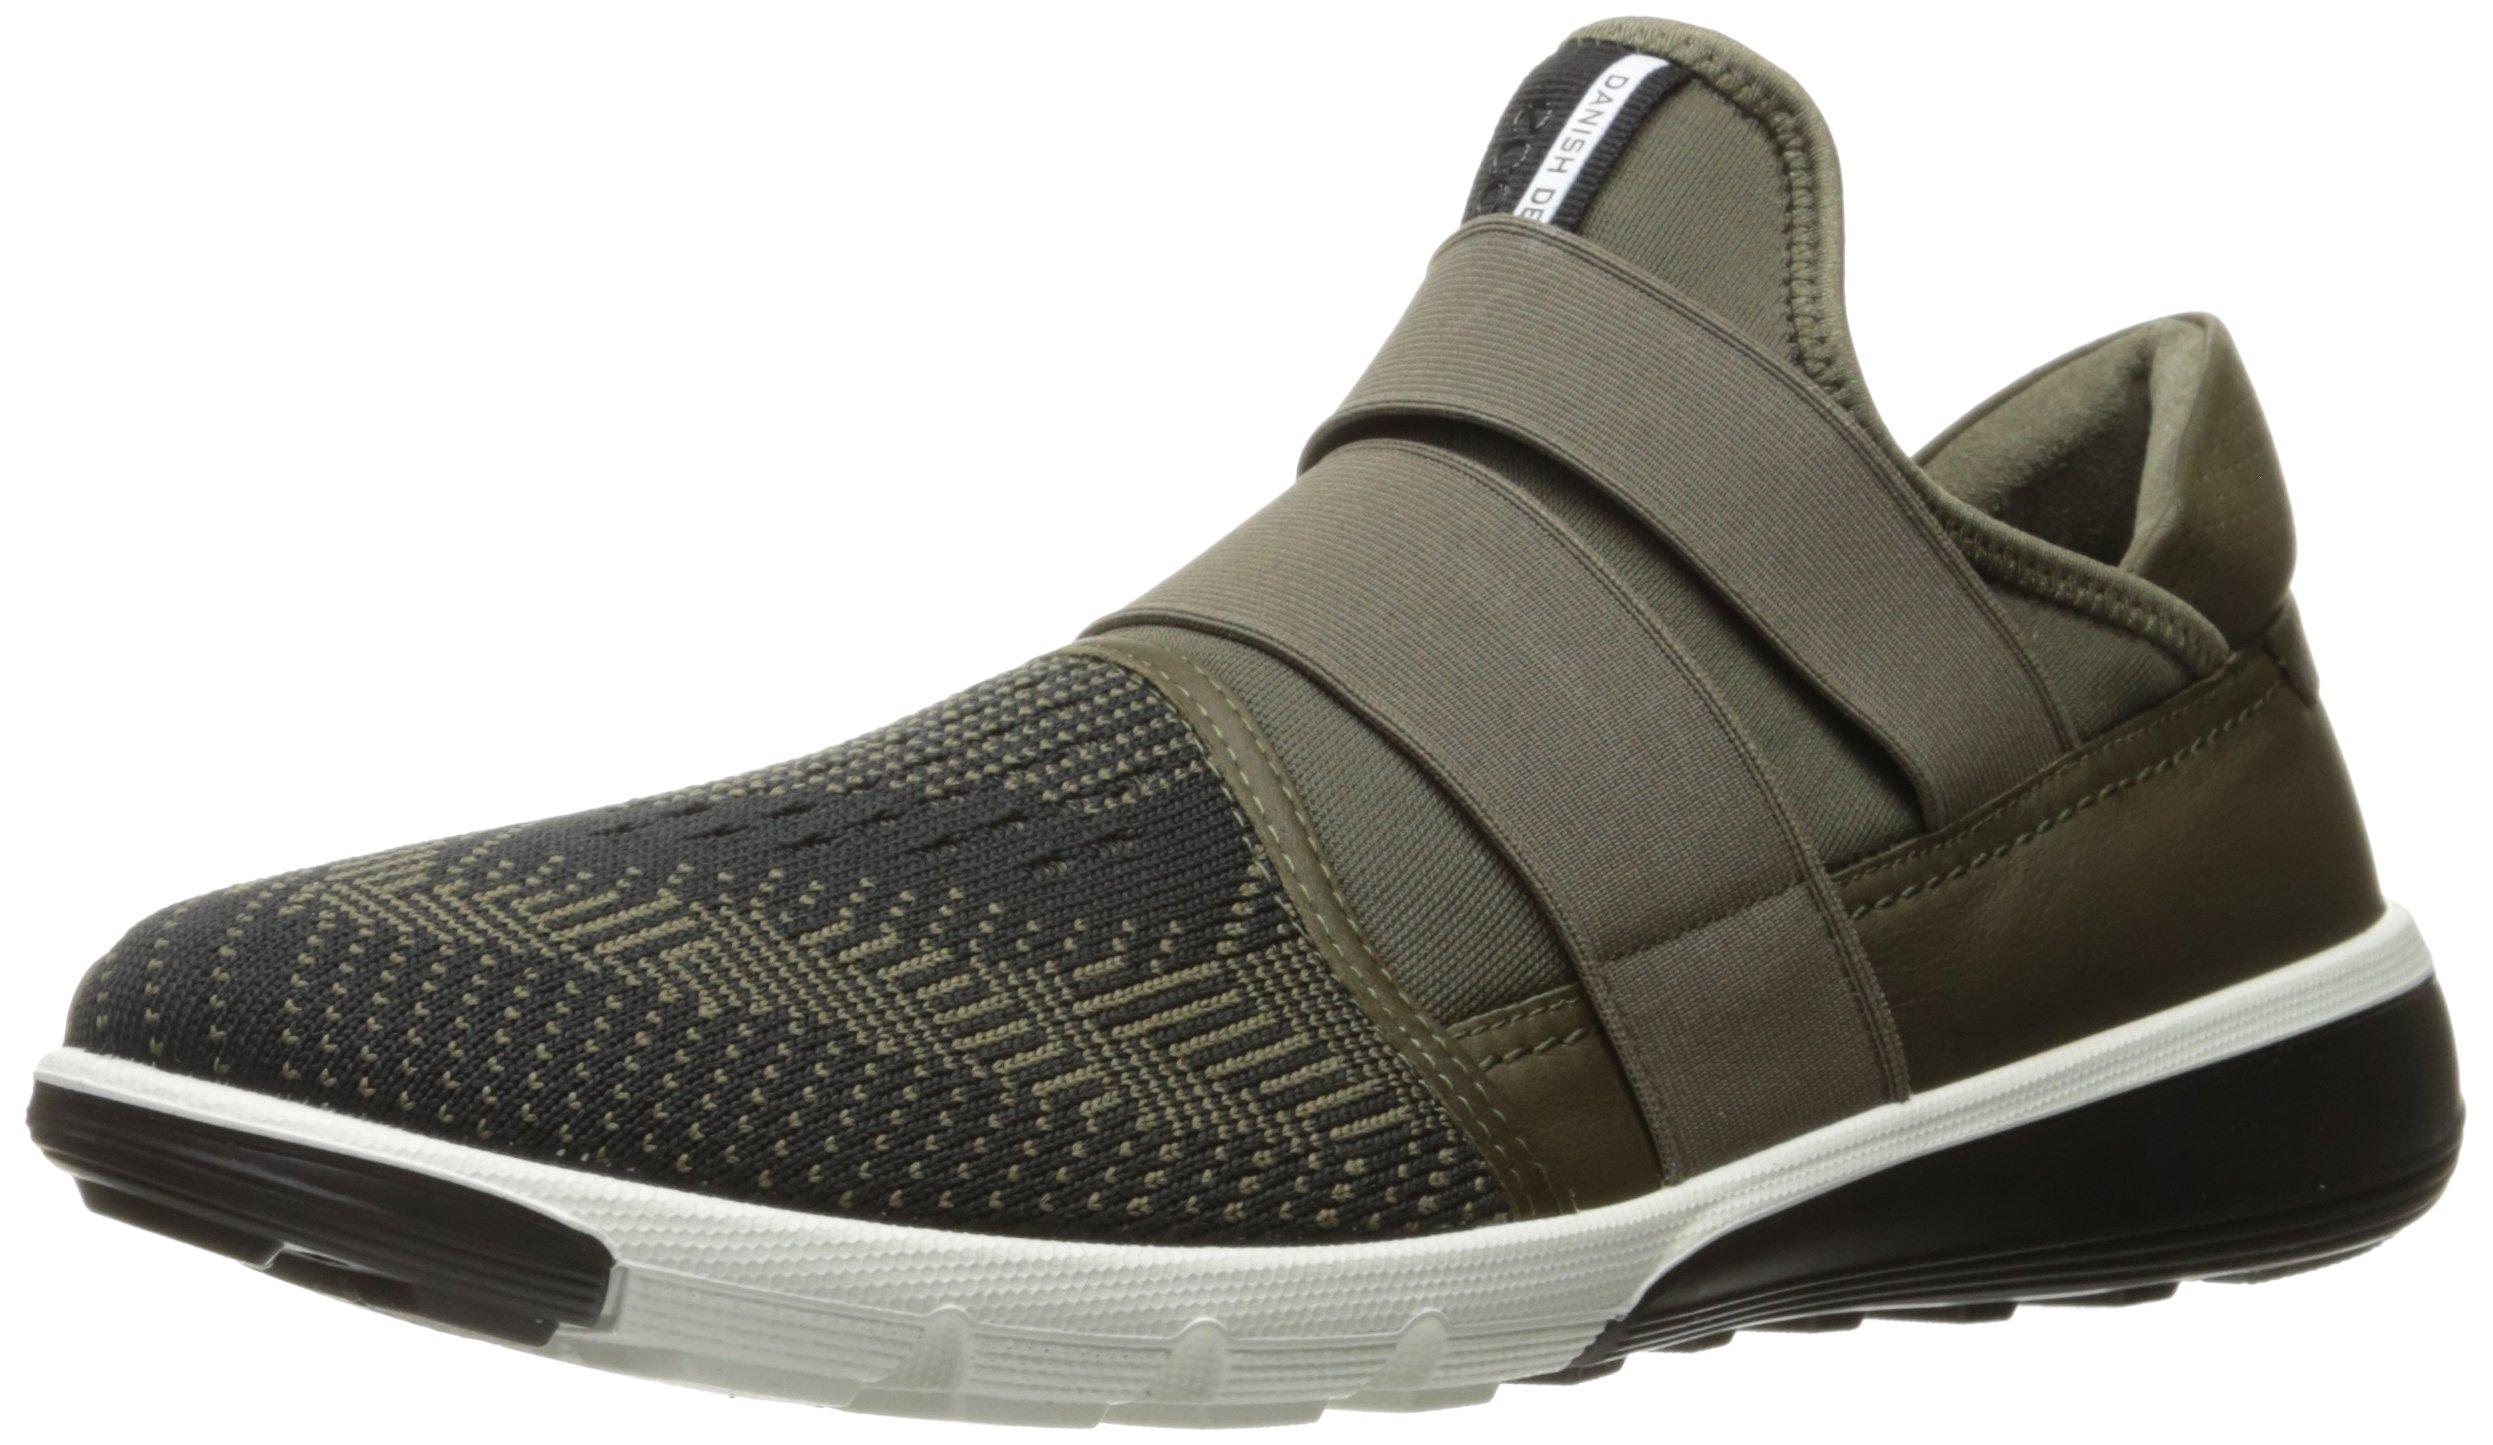 ECCO Men's Intrinsic 2 Slip on Fashion Sneaker, Tarmac, 45 EU/11-11.5 M US